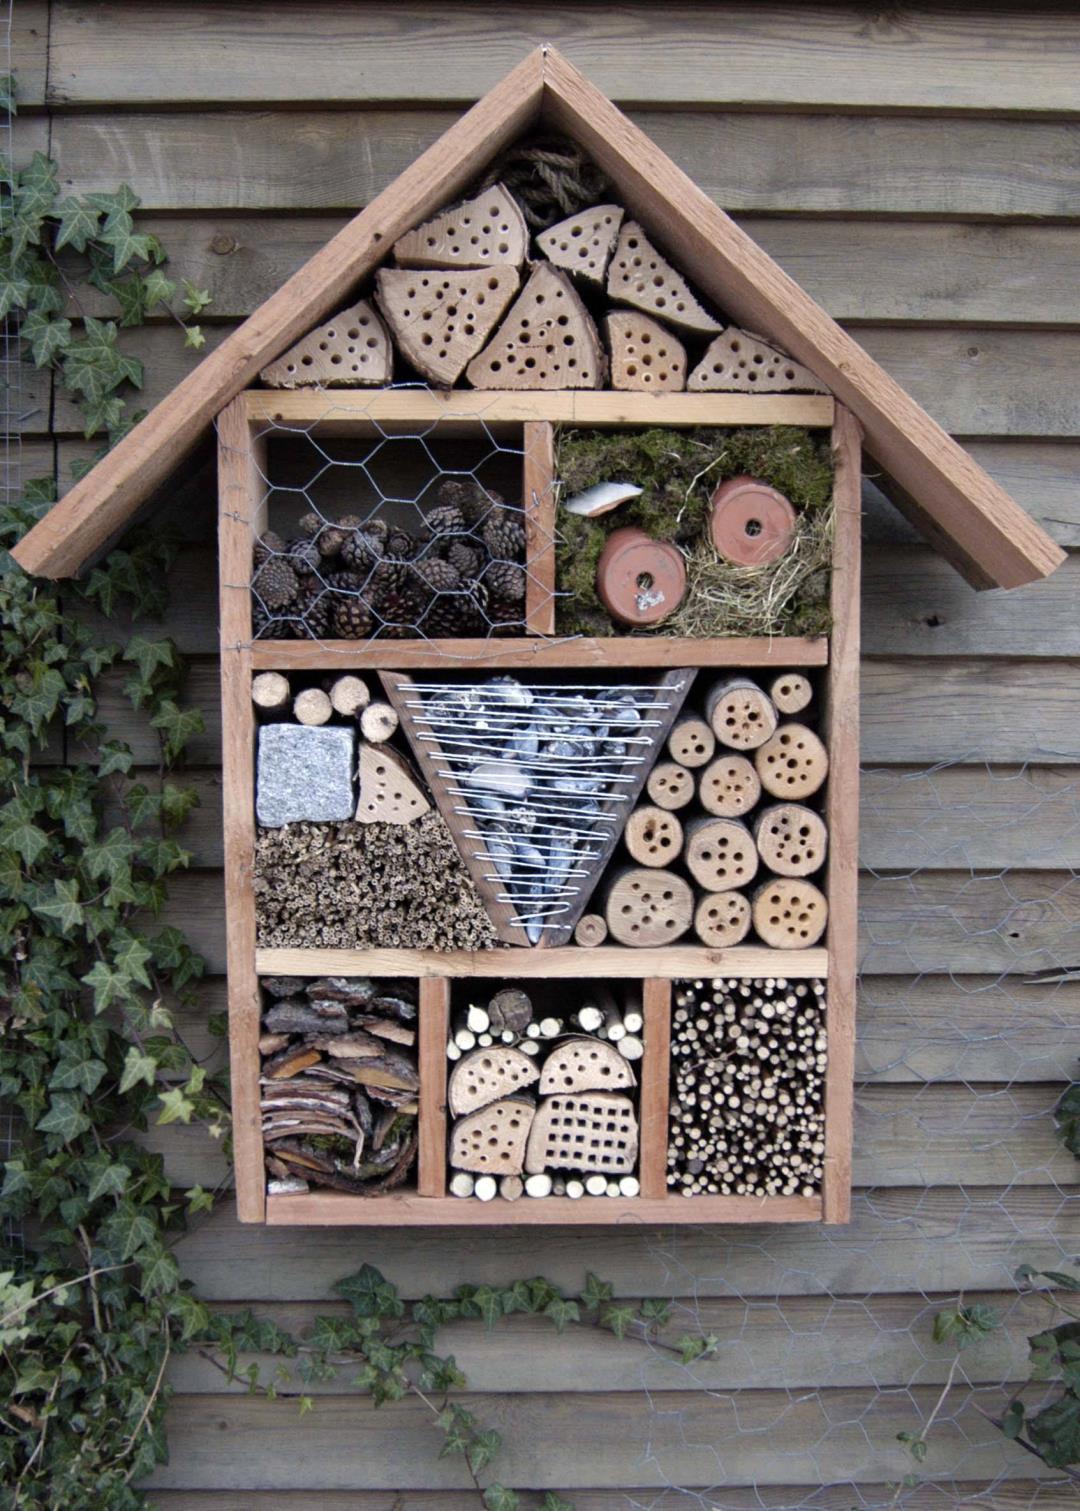 Krible krable og byg et hotel til bier eller insekter